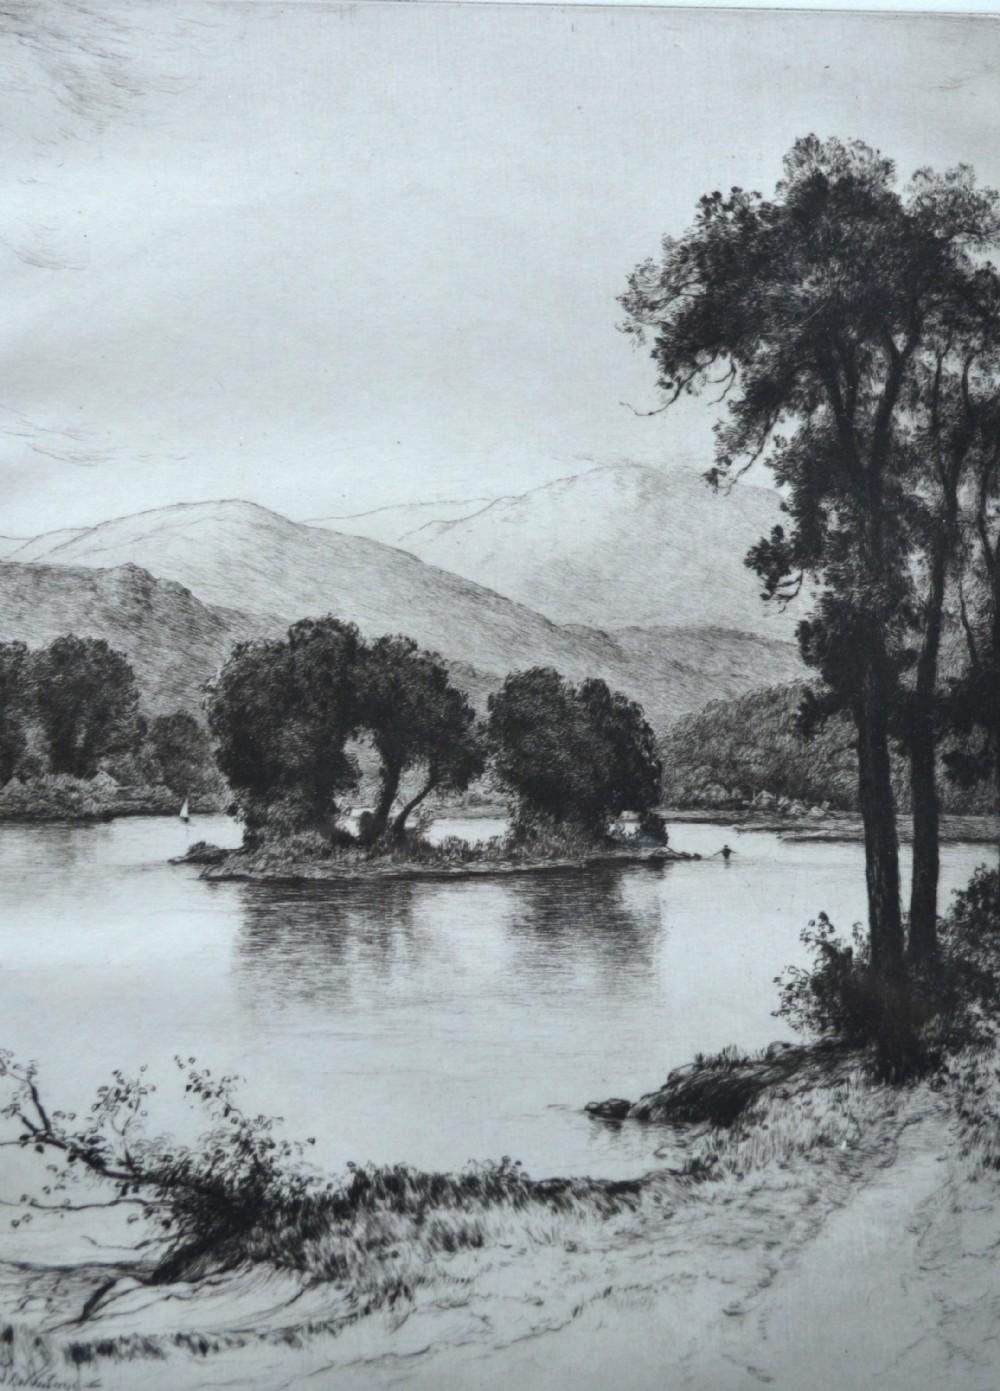 loch venachar scotland c1910 black white etching john fullwood 18541931 signed and titled